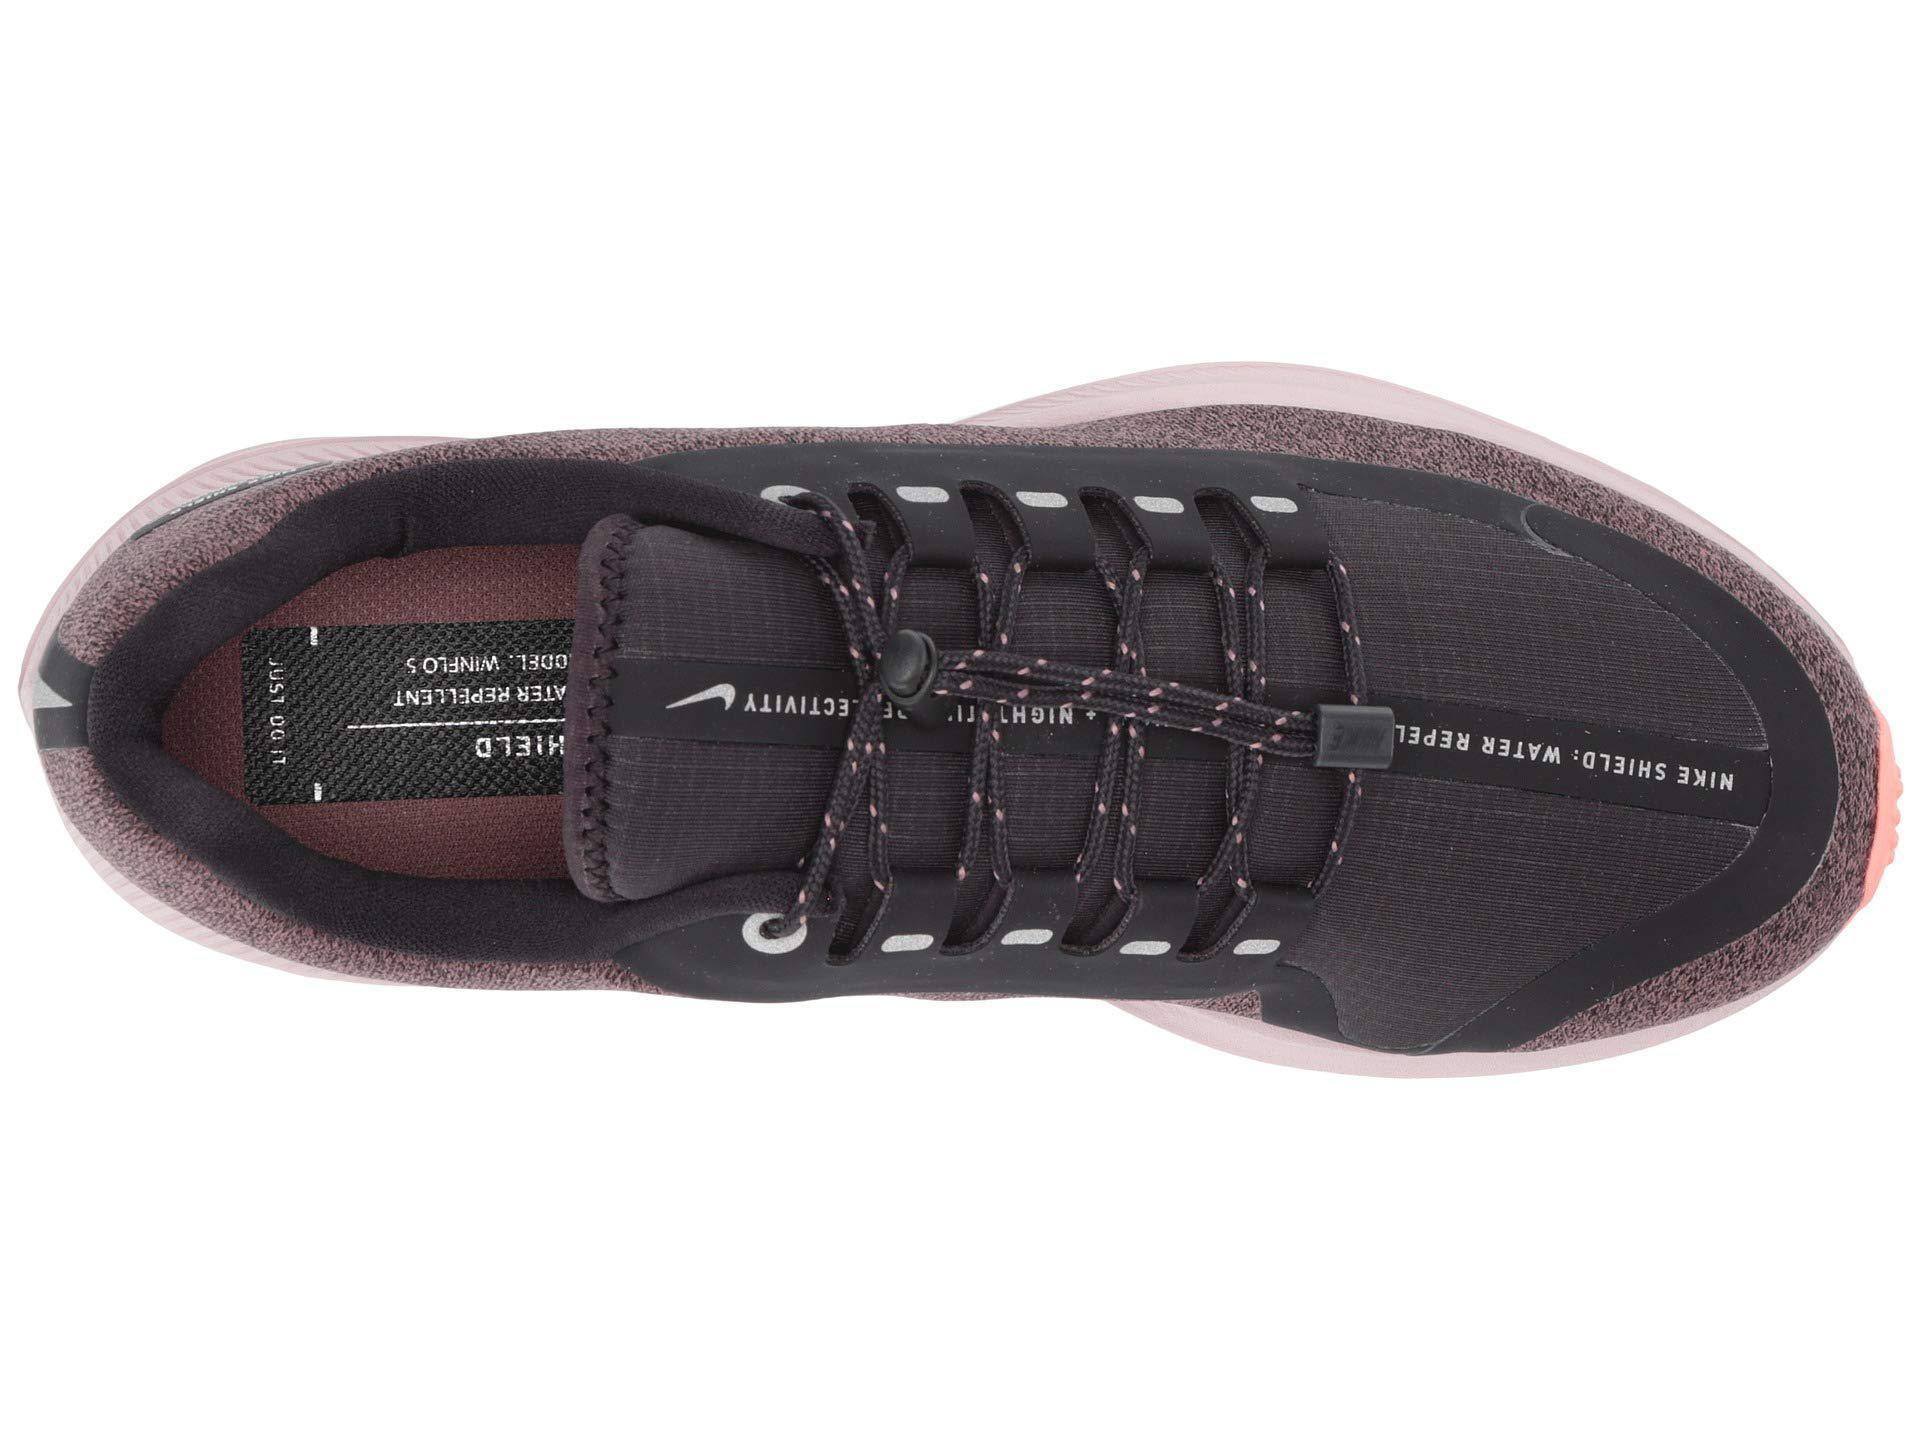 4b13b785a95 Nike - Air Zoom Winflo 5 Run Shield (smokey Mauve metallic Silver oil. View  fullscreen